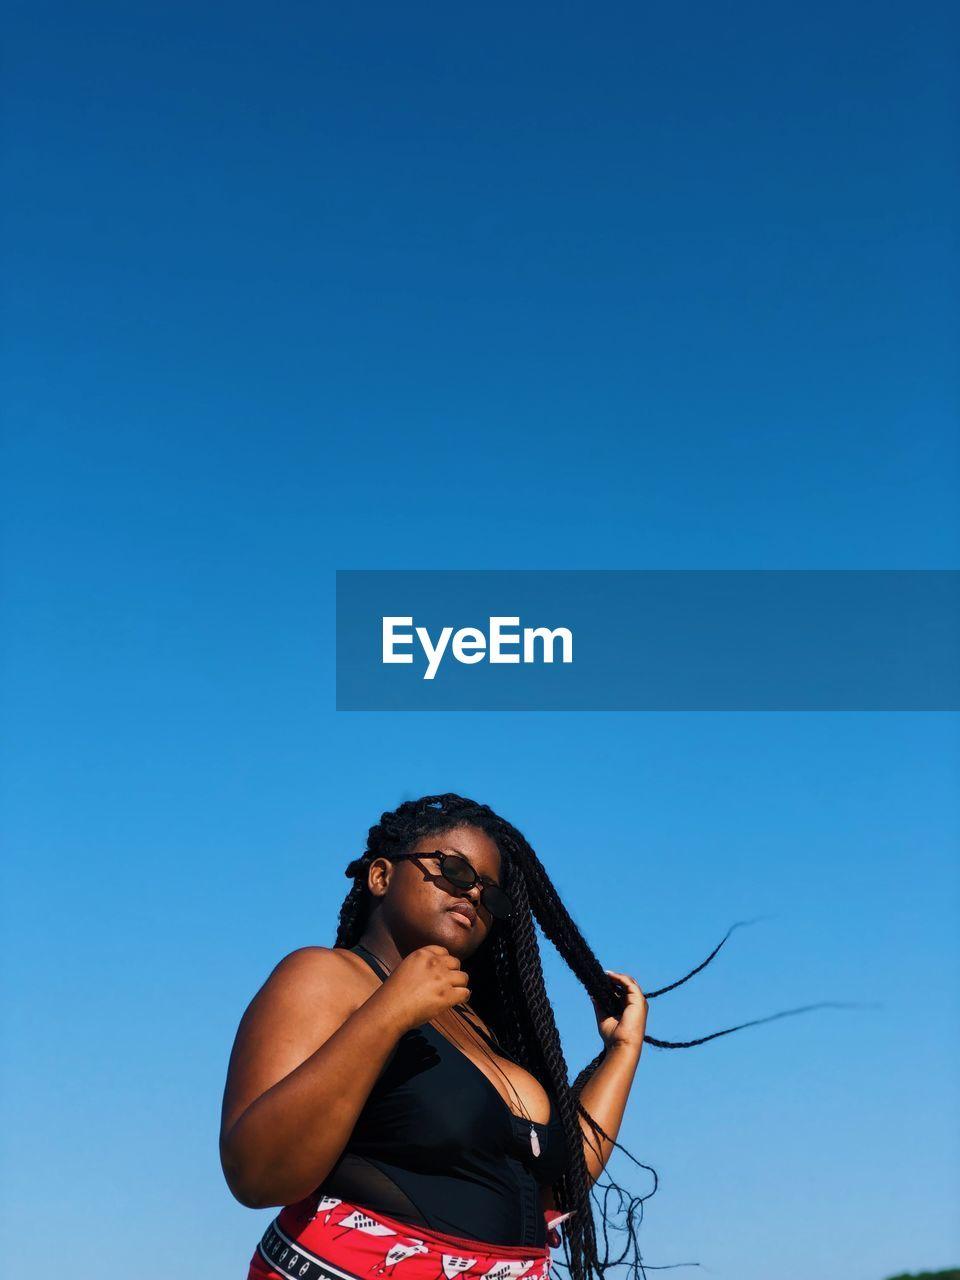 A peng black girl basking in the african sun